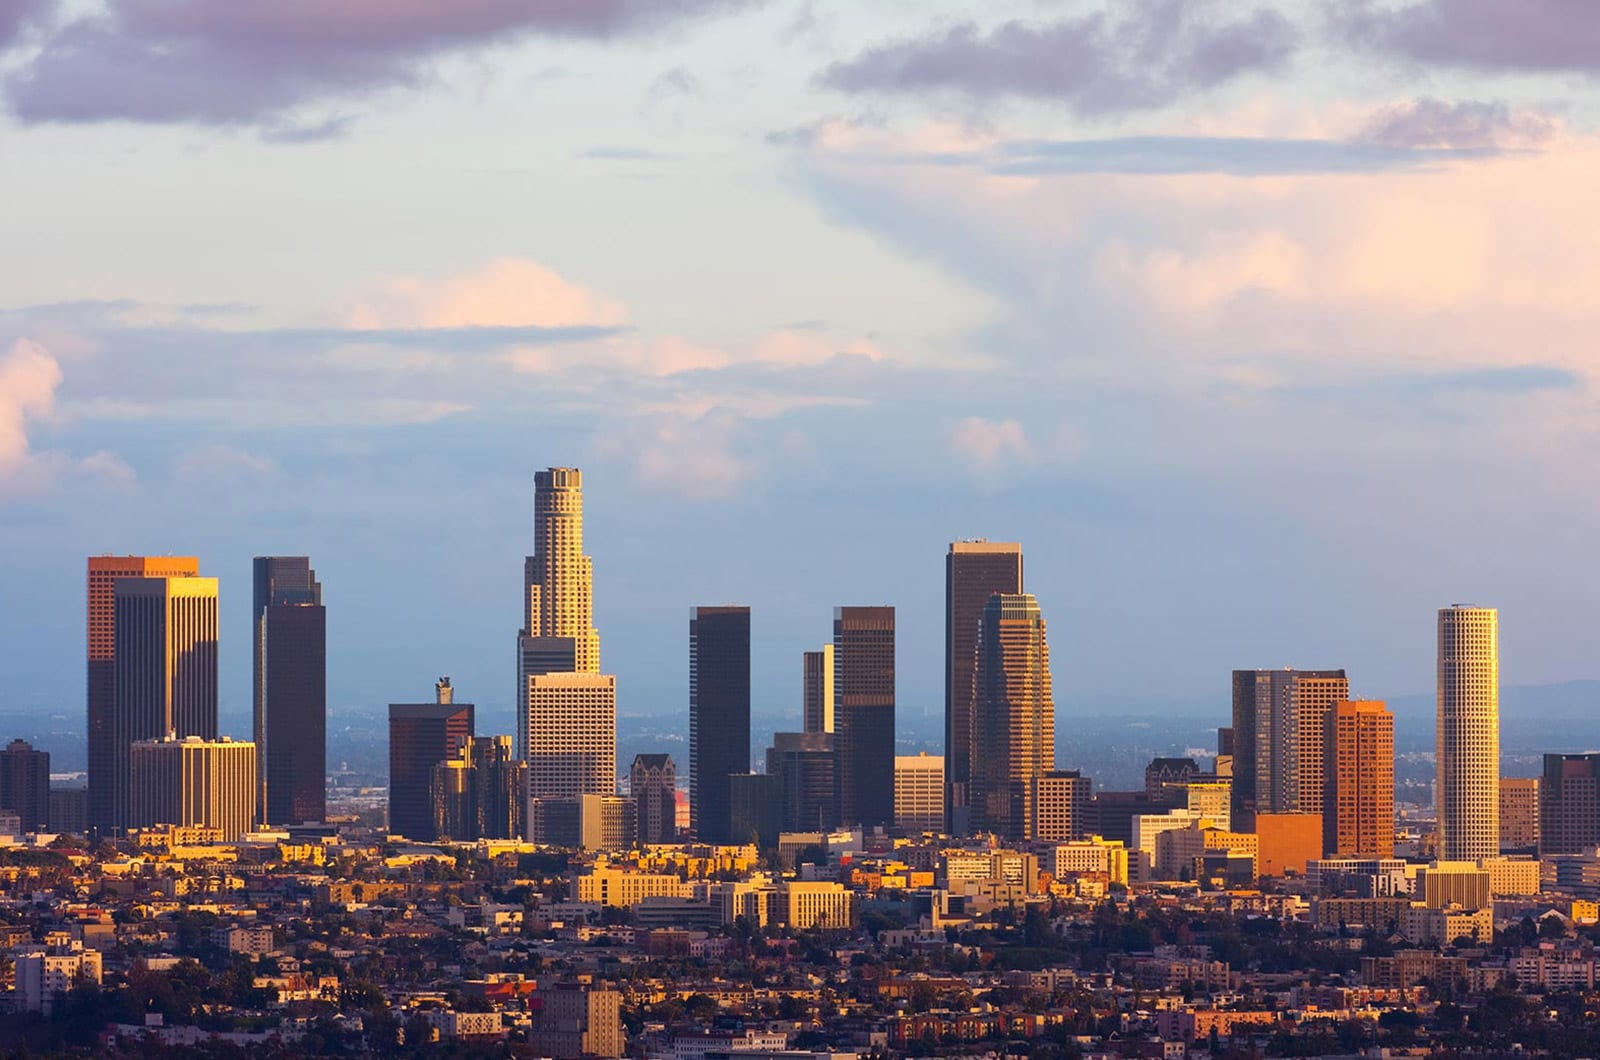 Featured Image Los Angeles | Los Angeles Virtual Tour Photographer | Los Angeles 360 Photography Services | Los Angeles HDR Real Estate Photographer | Los Angeles Matterport 3D Tour Service Provider